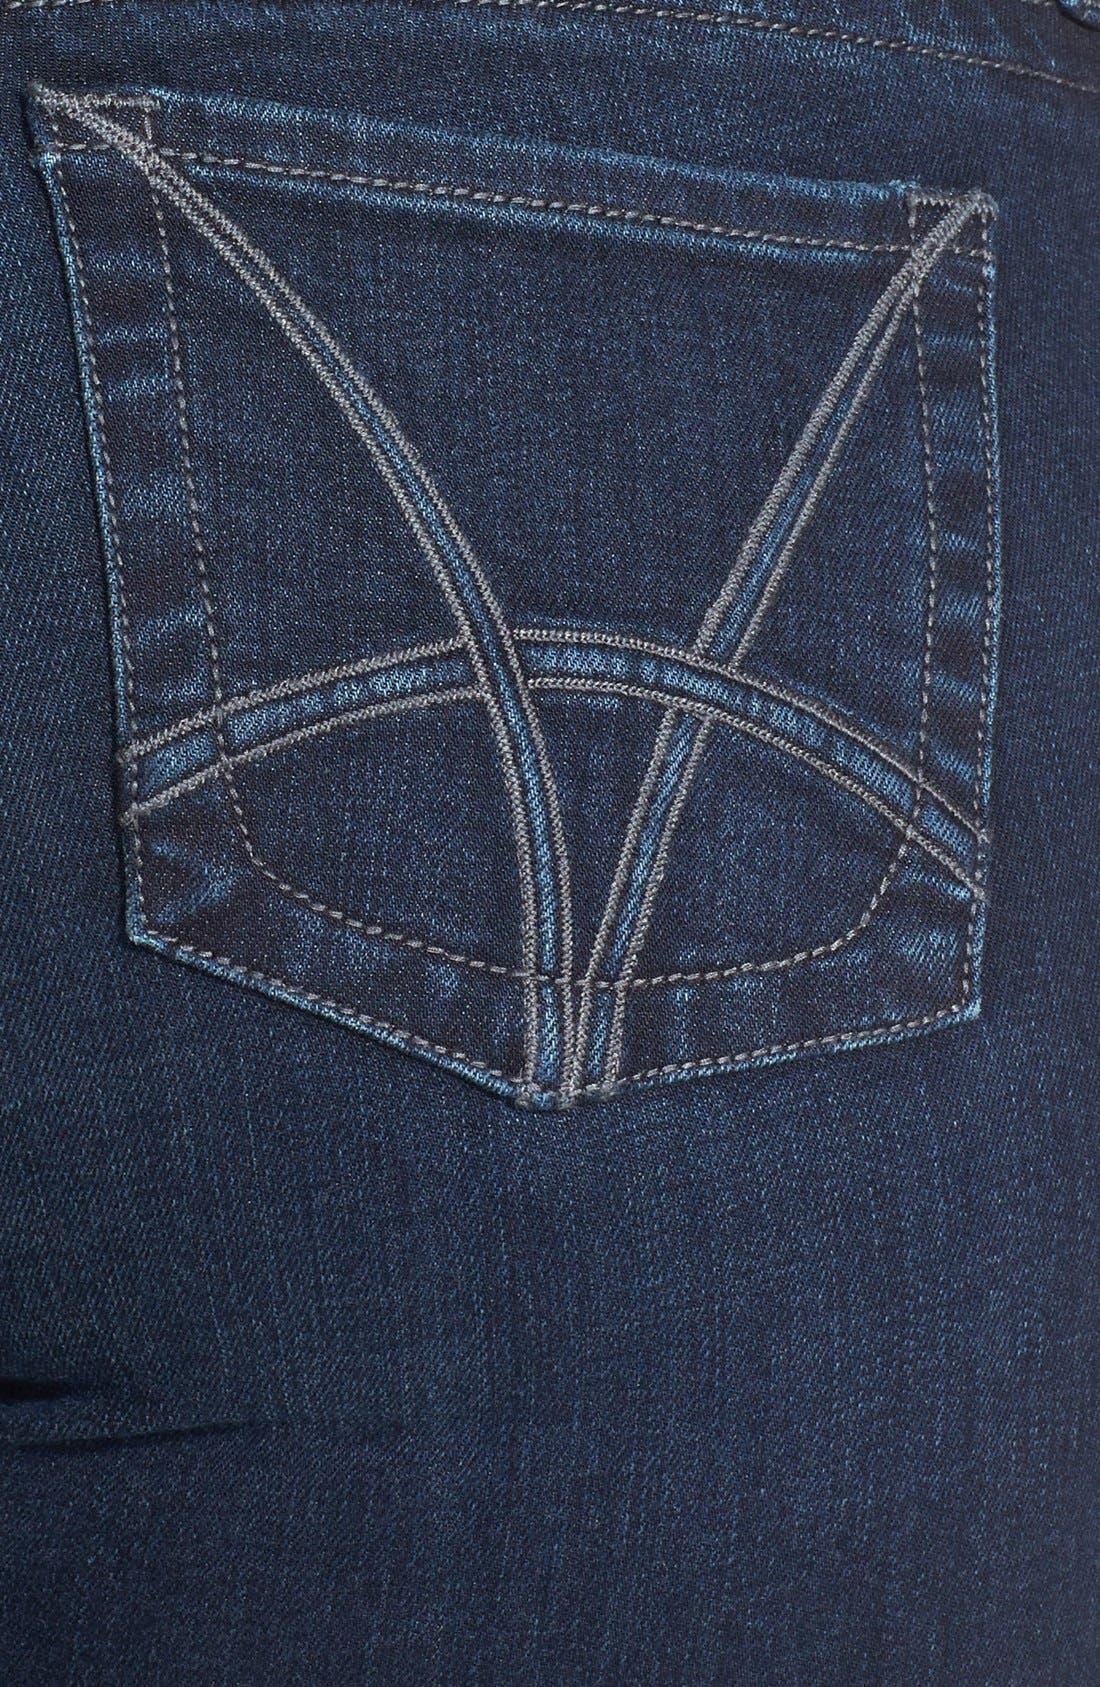 Alternate Image 3  - KUT from the Kloth 'Stevie' Straight Leg Jeans (Progressive) (Plus Size) (Online Only)